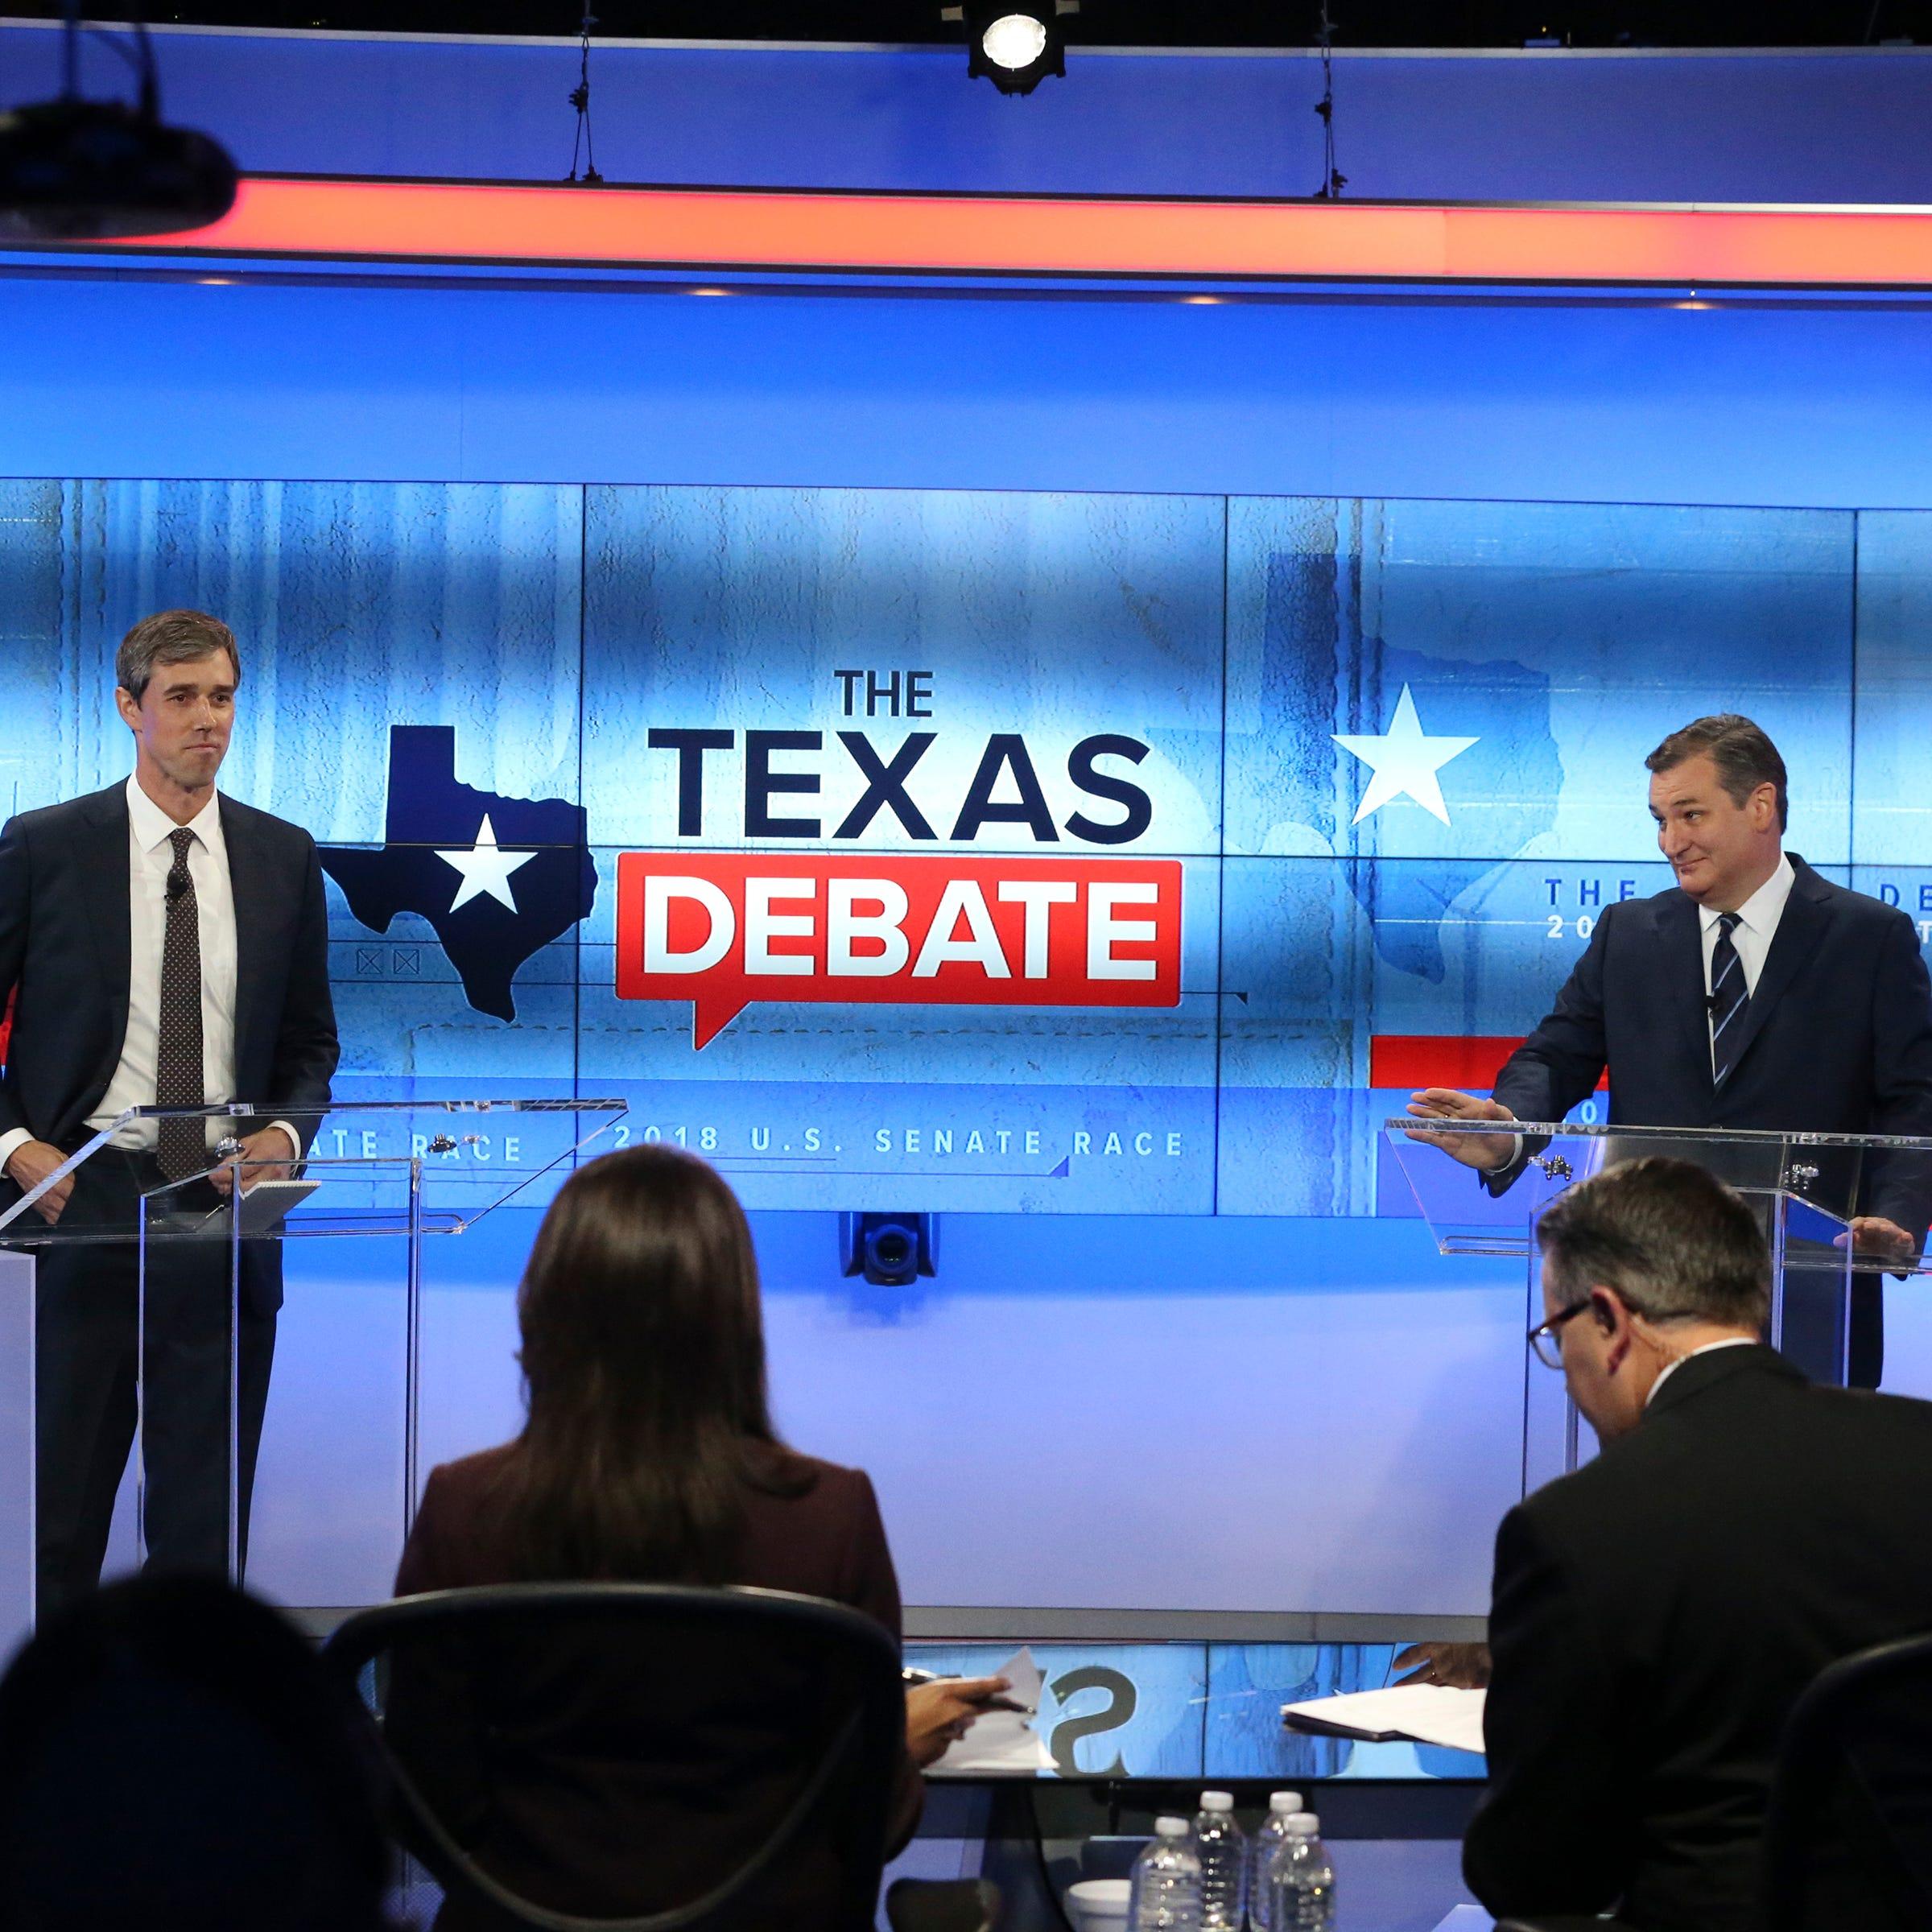 Beto-Cruz Debate: What Ellen DeGeneres and others are saying online about the debate